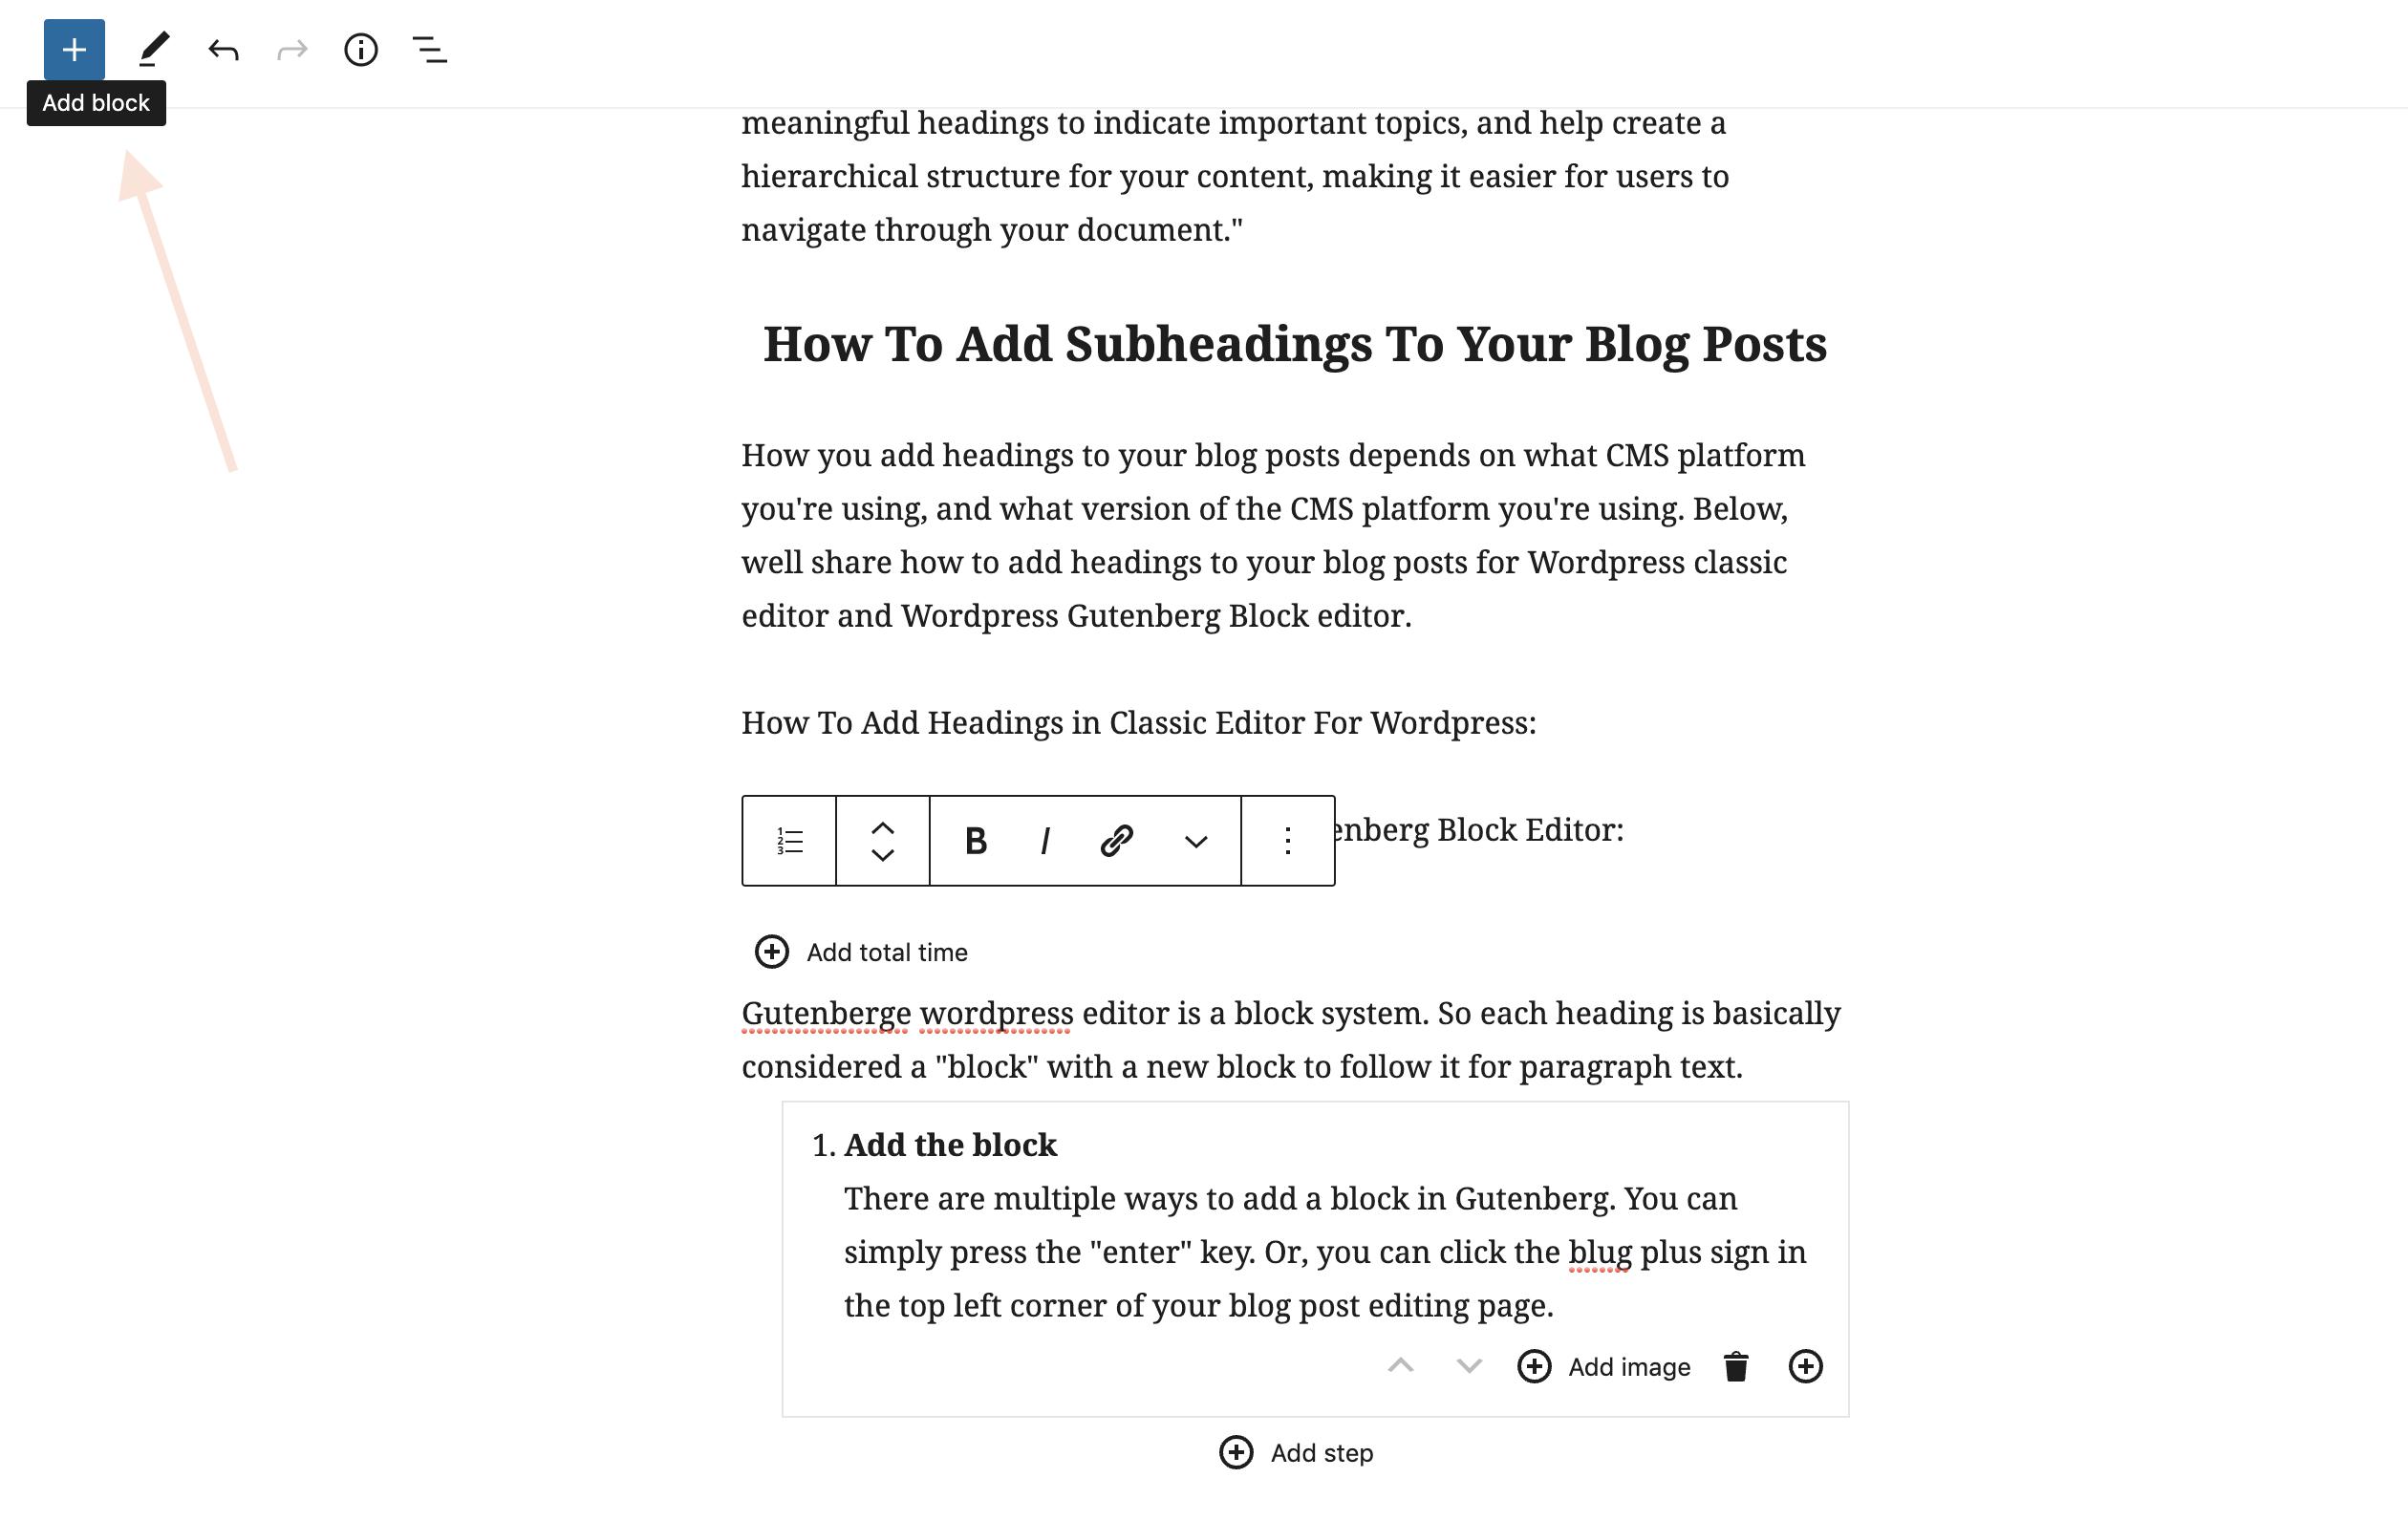 Adding a block to wordpress blog post in Gutenberg editor